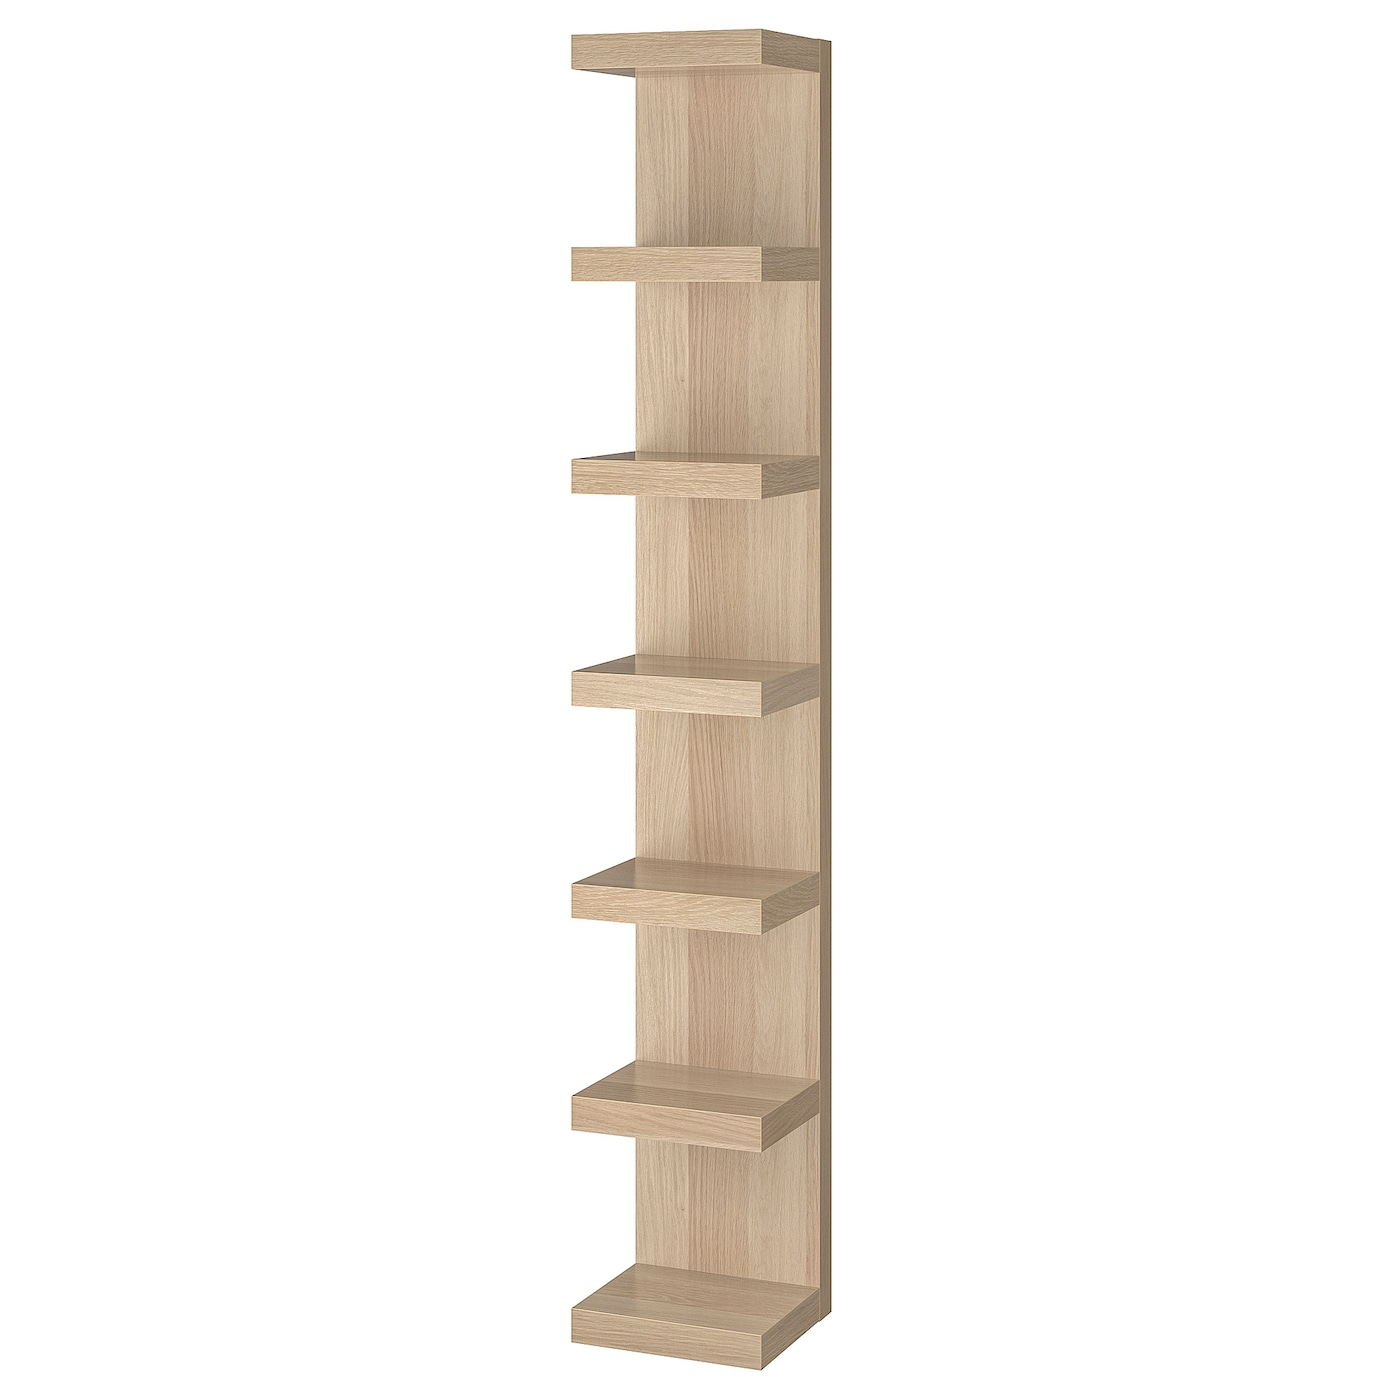 Wall Shelf Unit Lack White Stained Oak Effect